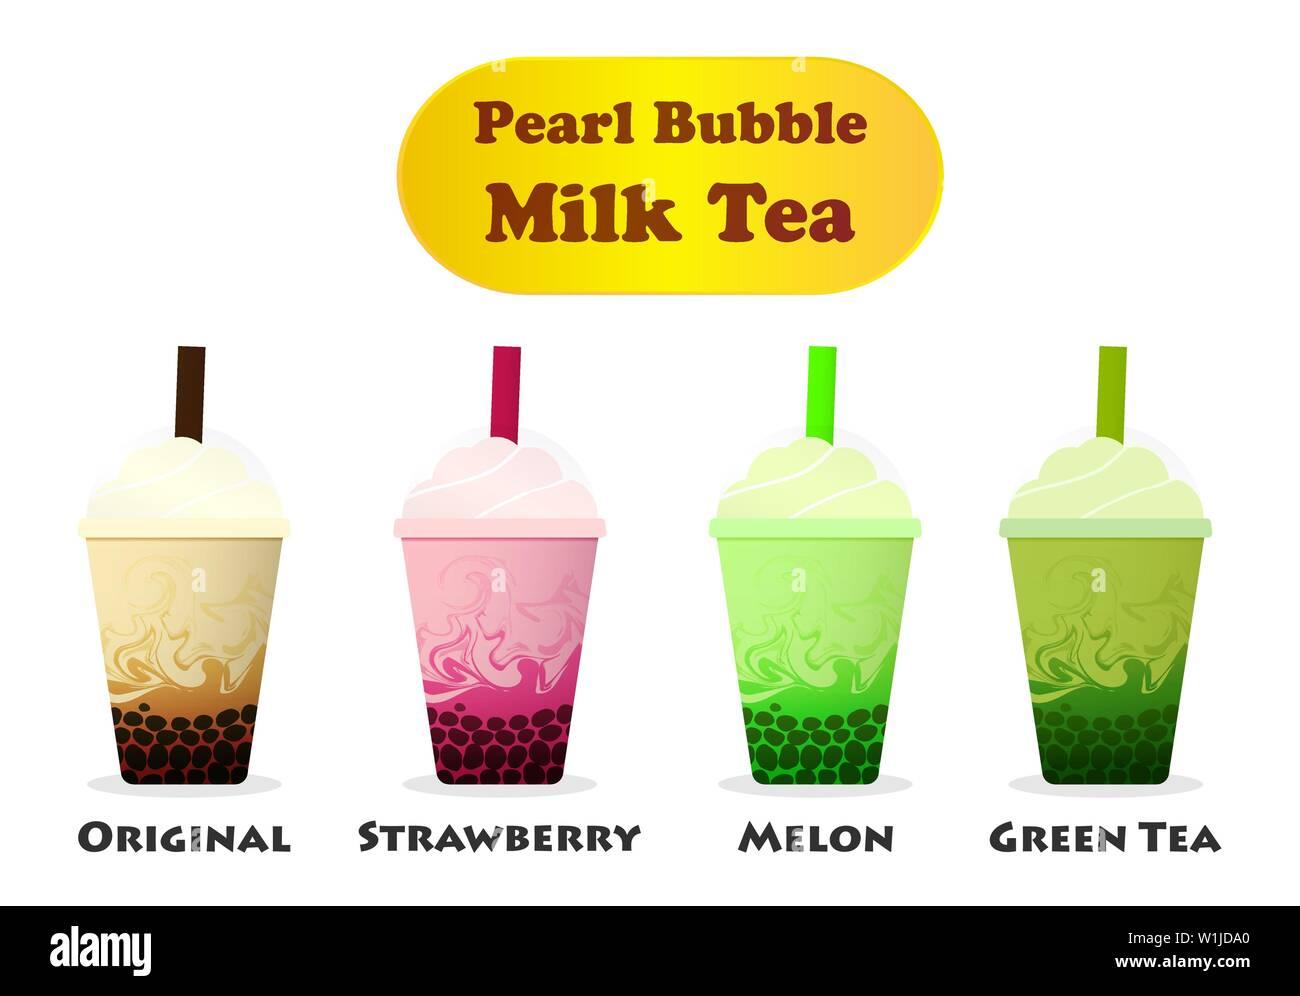 side view pearl bubble milk tea on white vector art stock vector image art alamy https www alamy com side view pearl bubble milk tea on white vector art image259175784 html